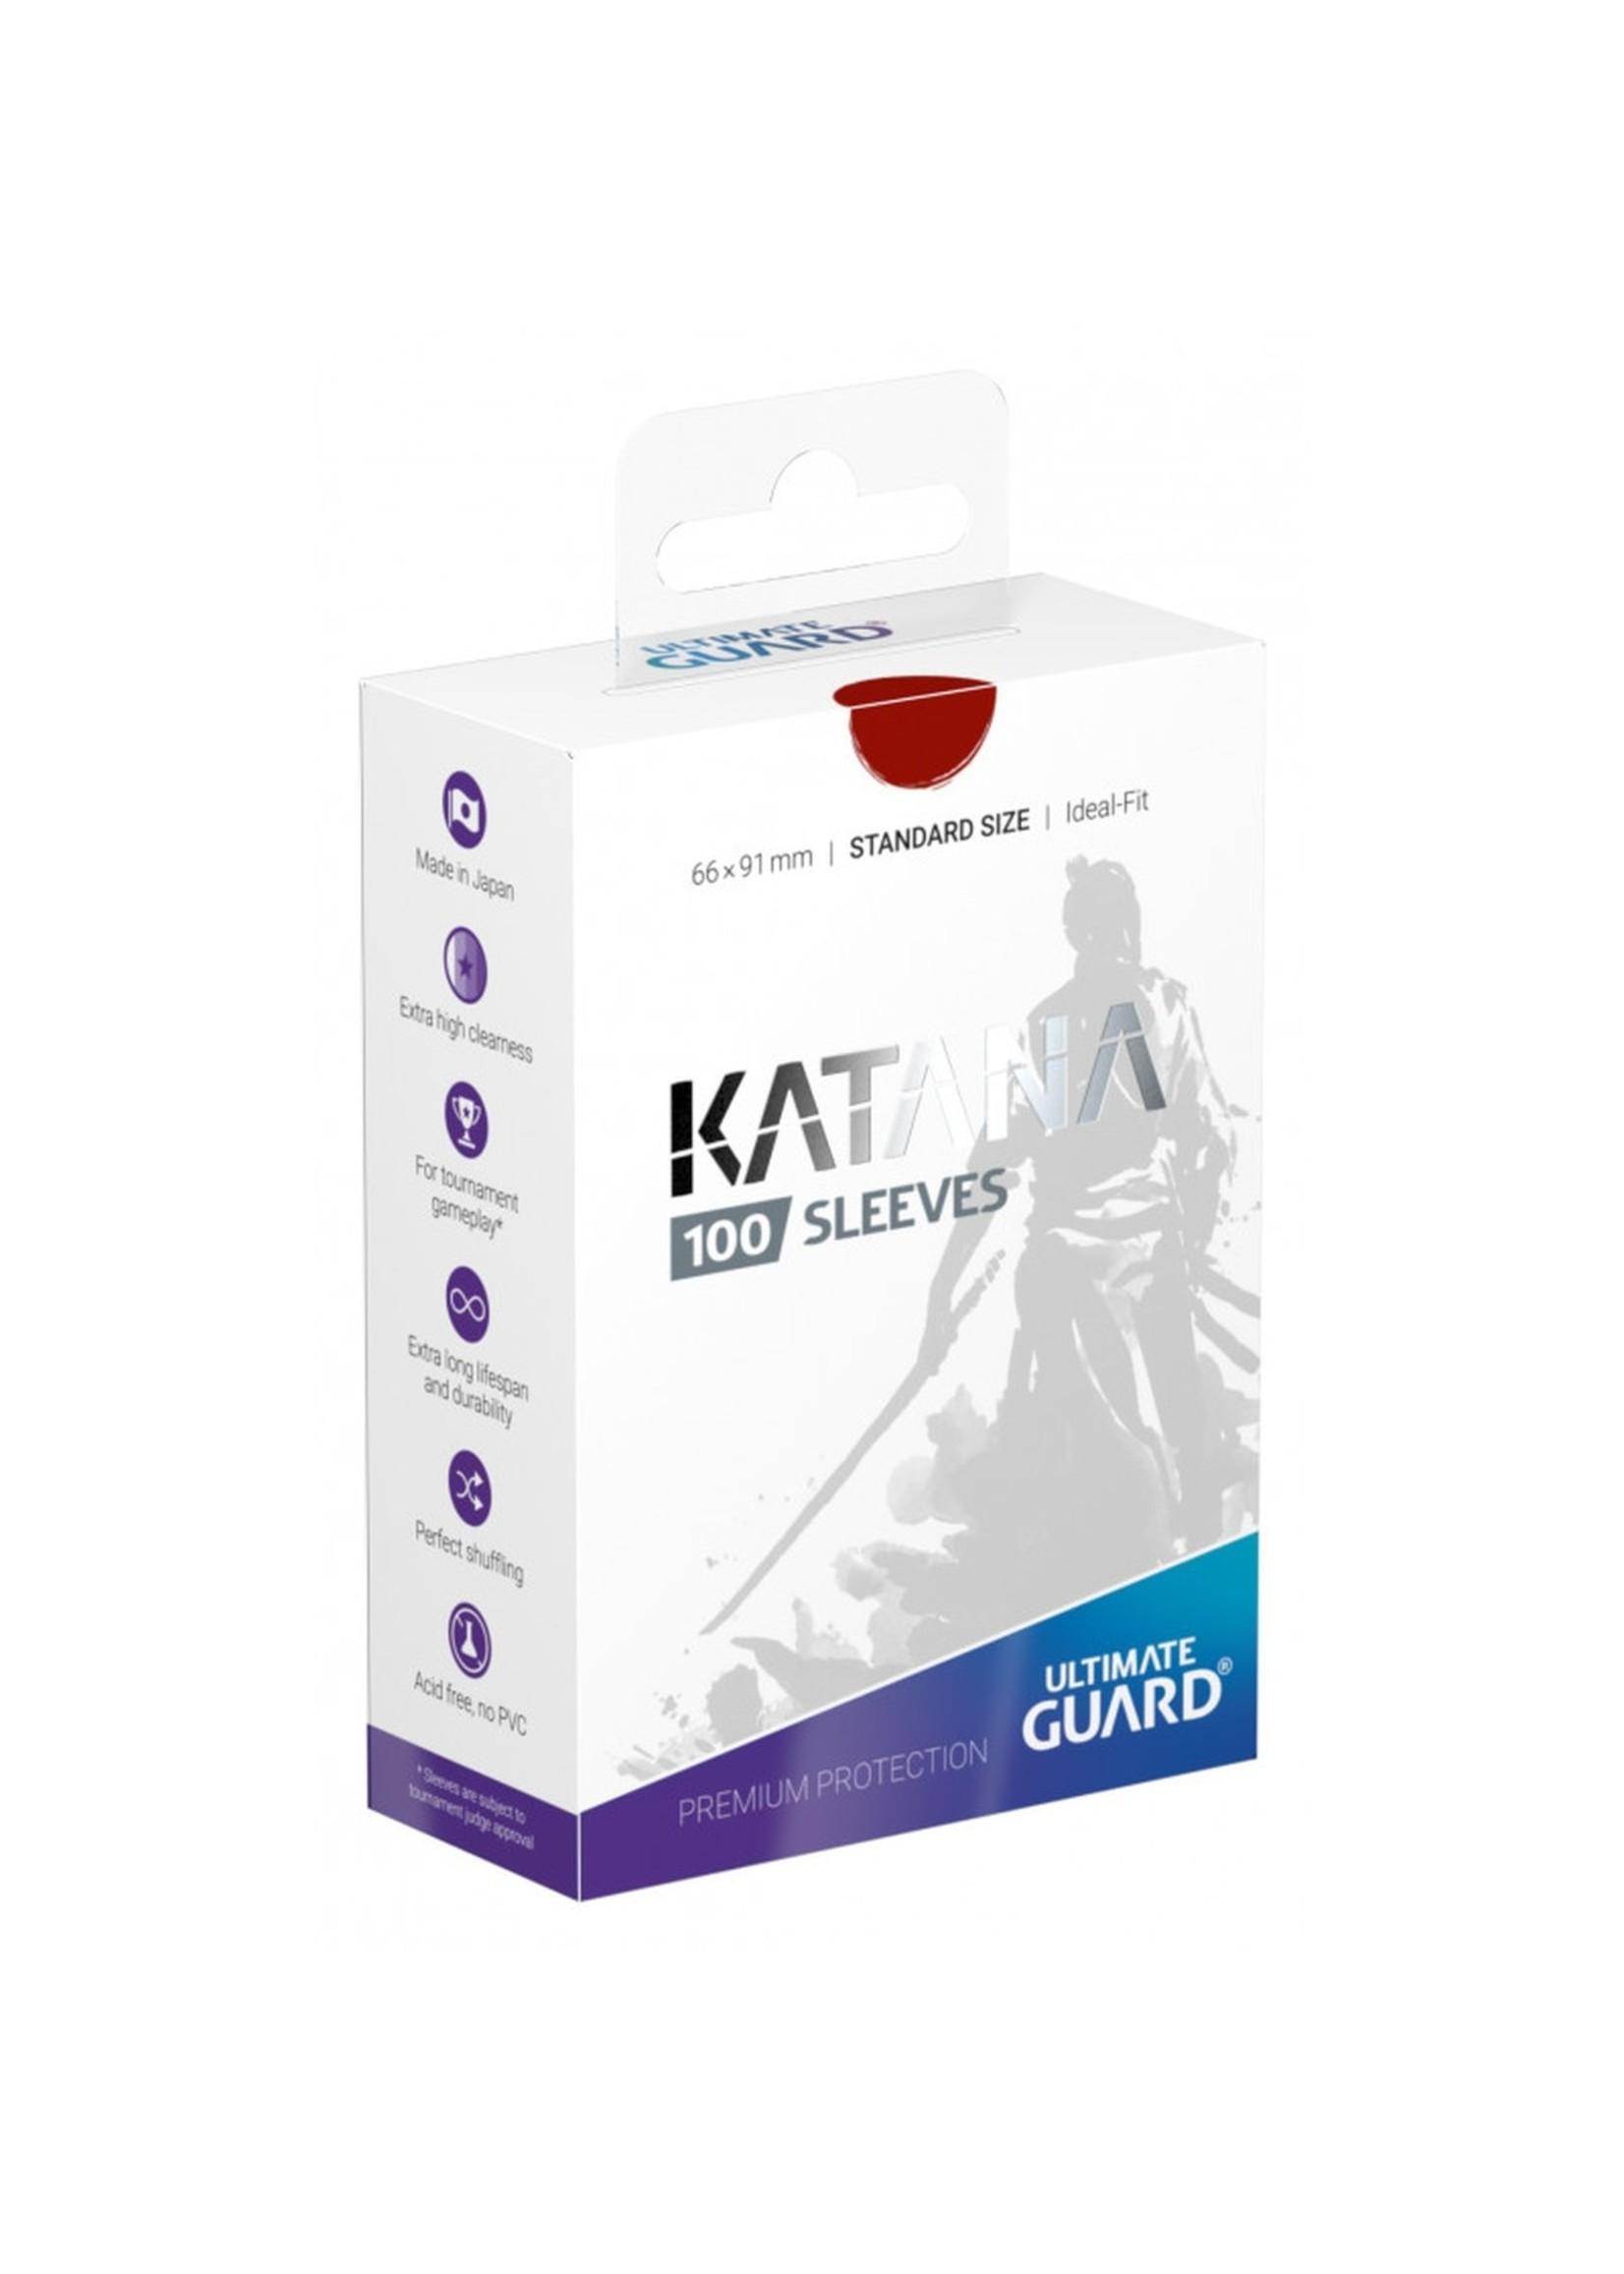 Katana Card Sleeves 100ct Red